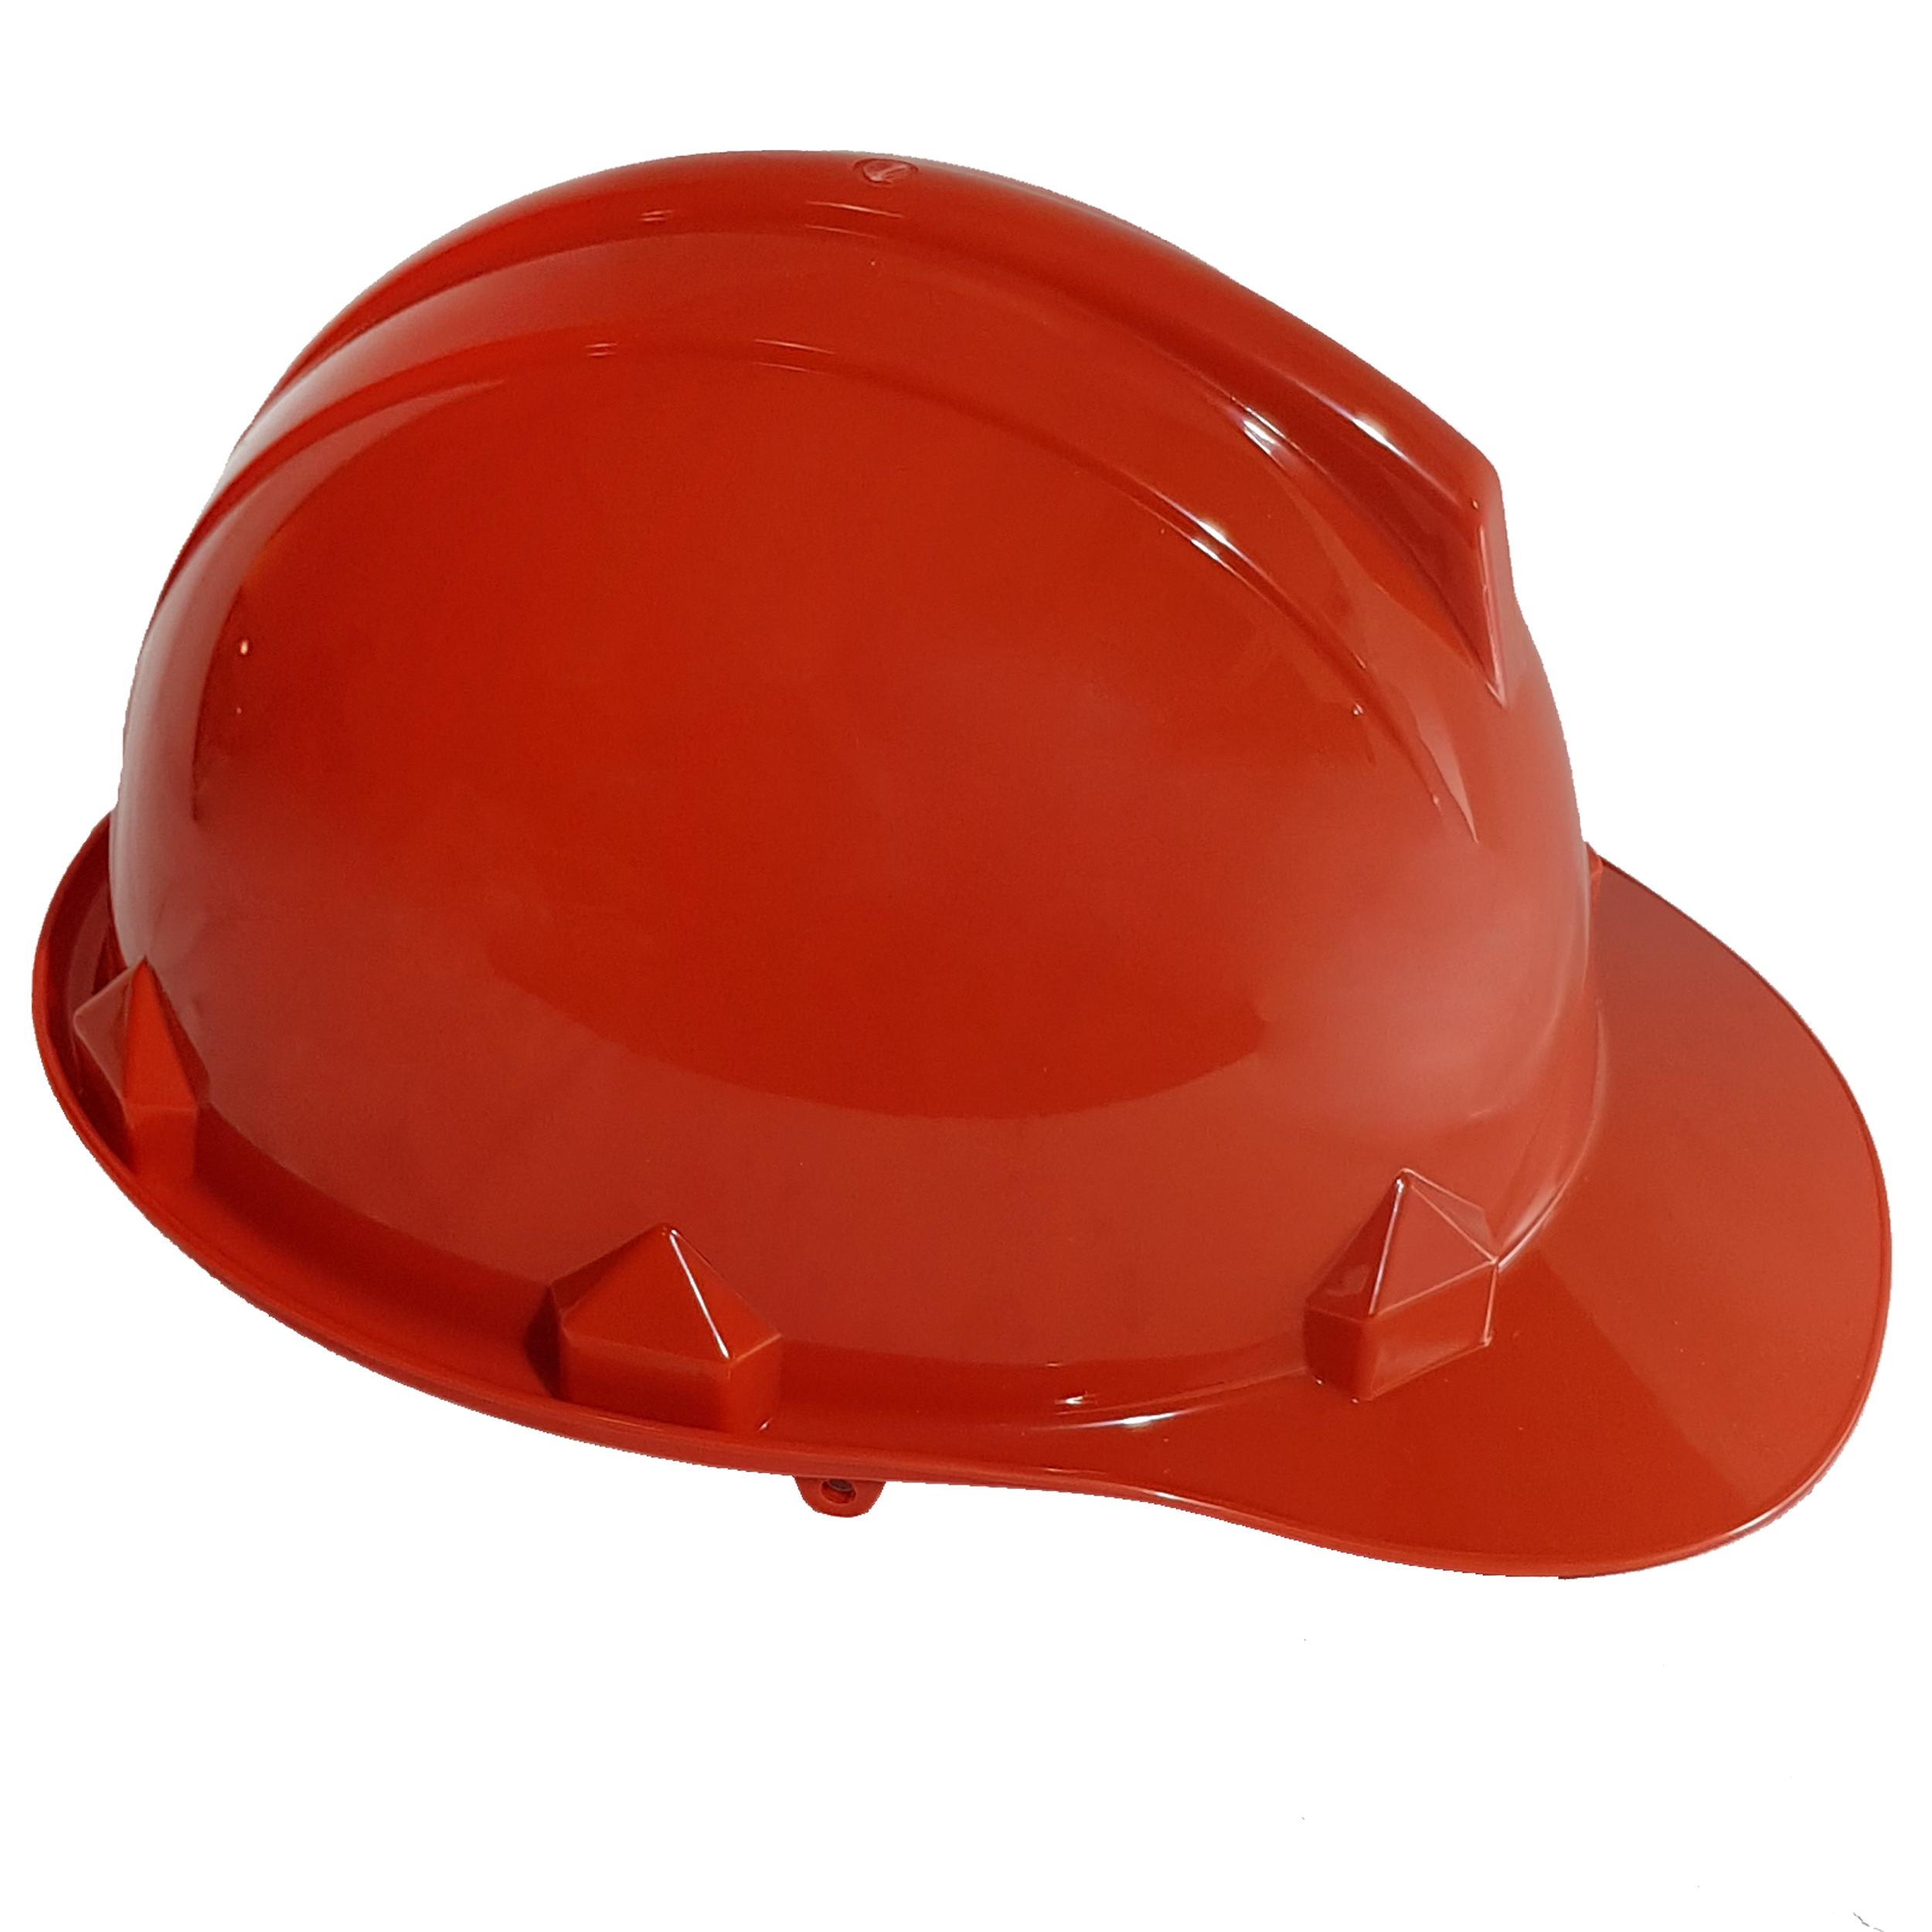 کلاه ایمنی مدل بلو ایگل HR35